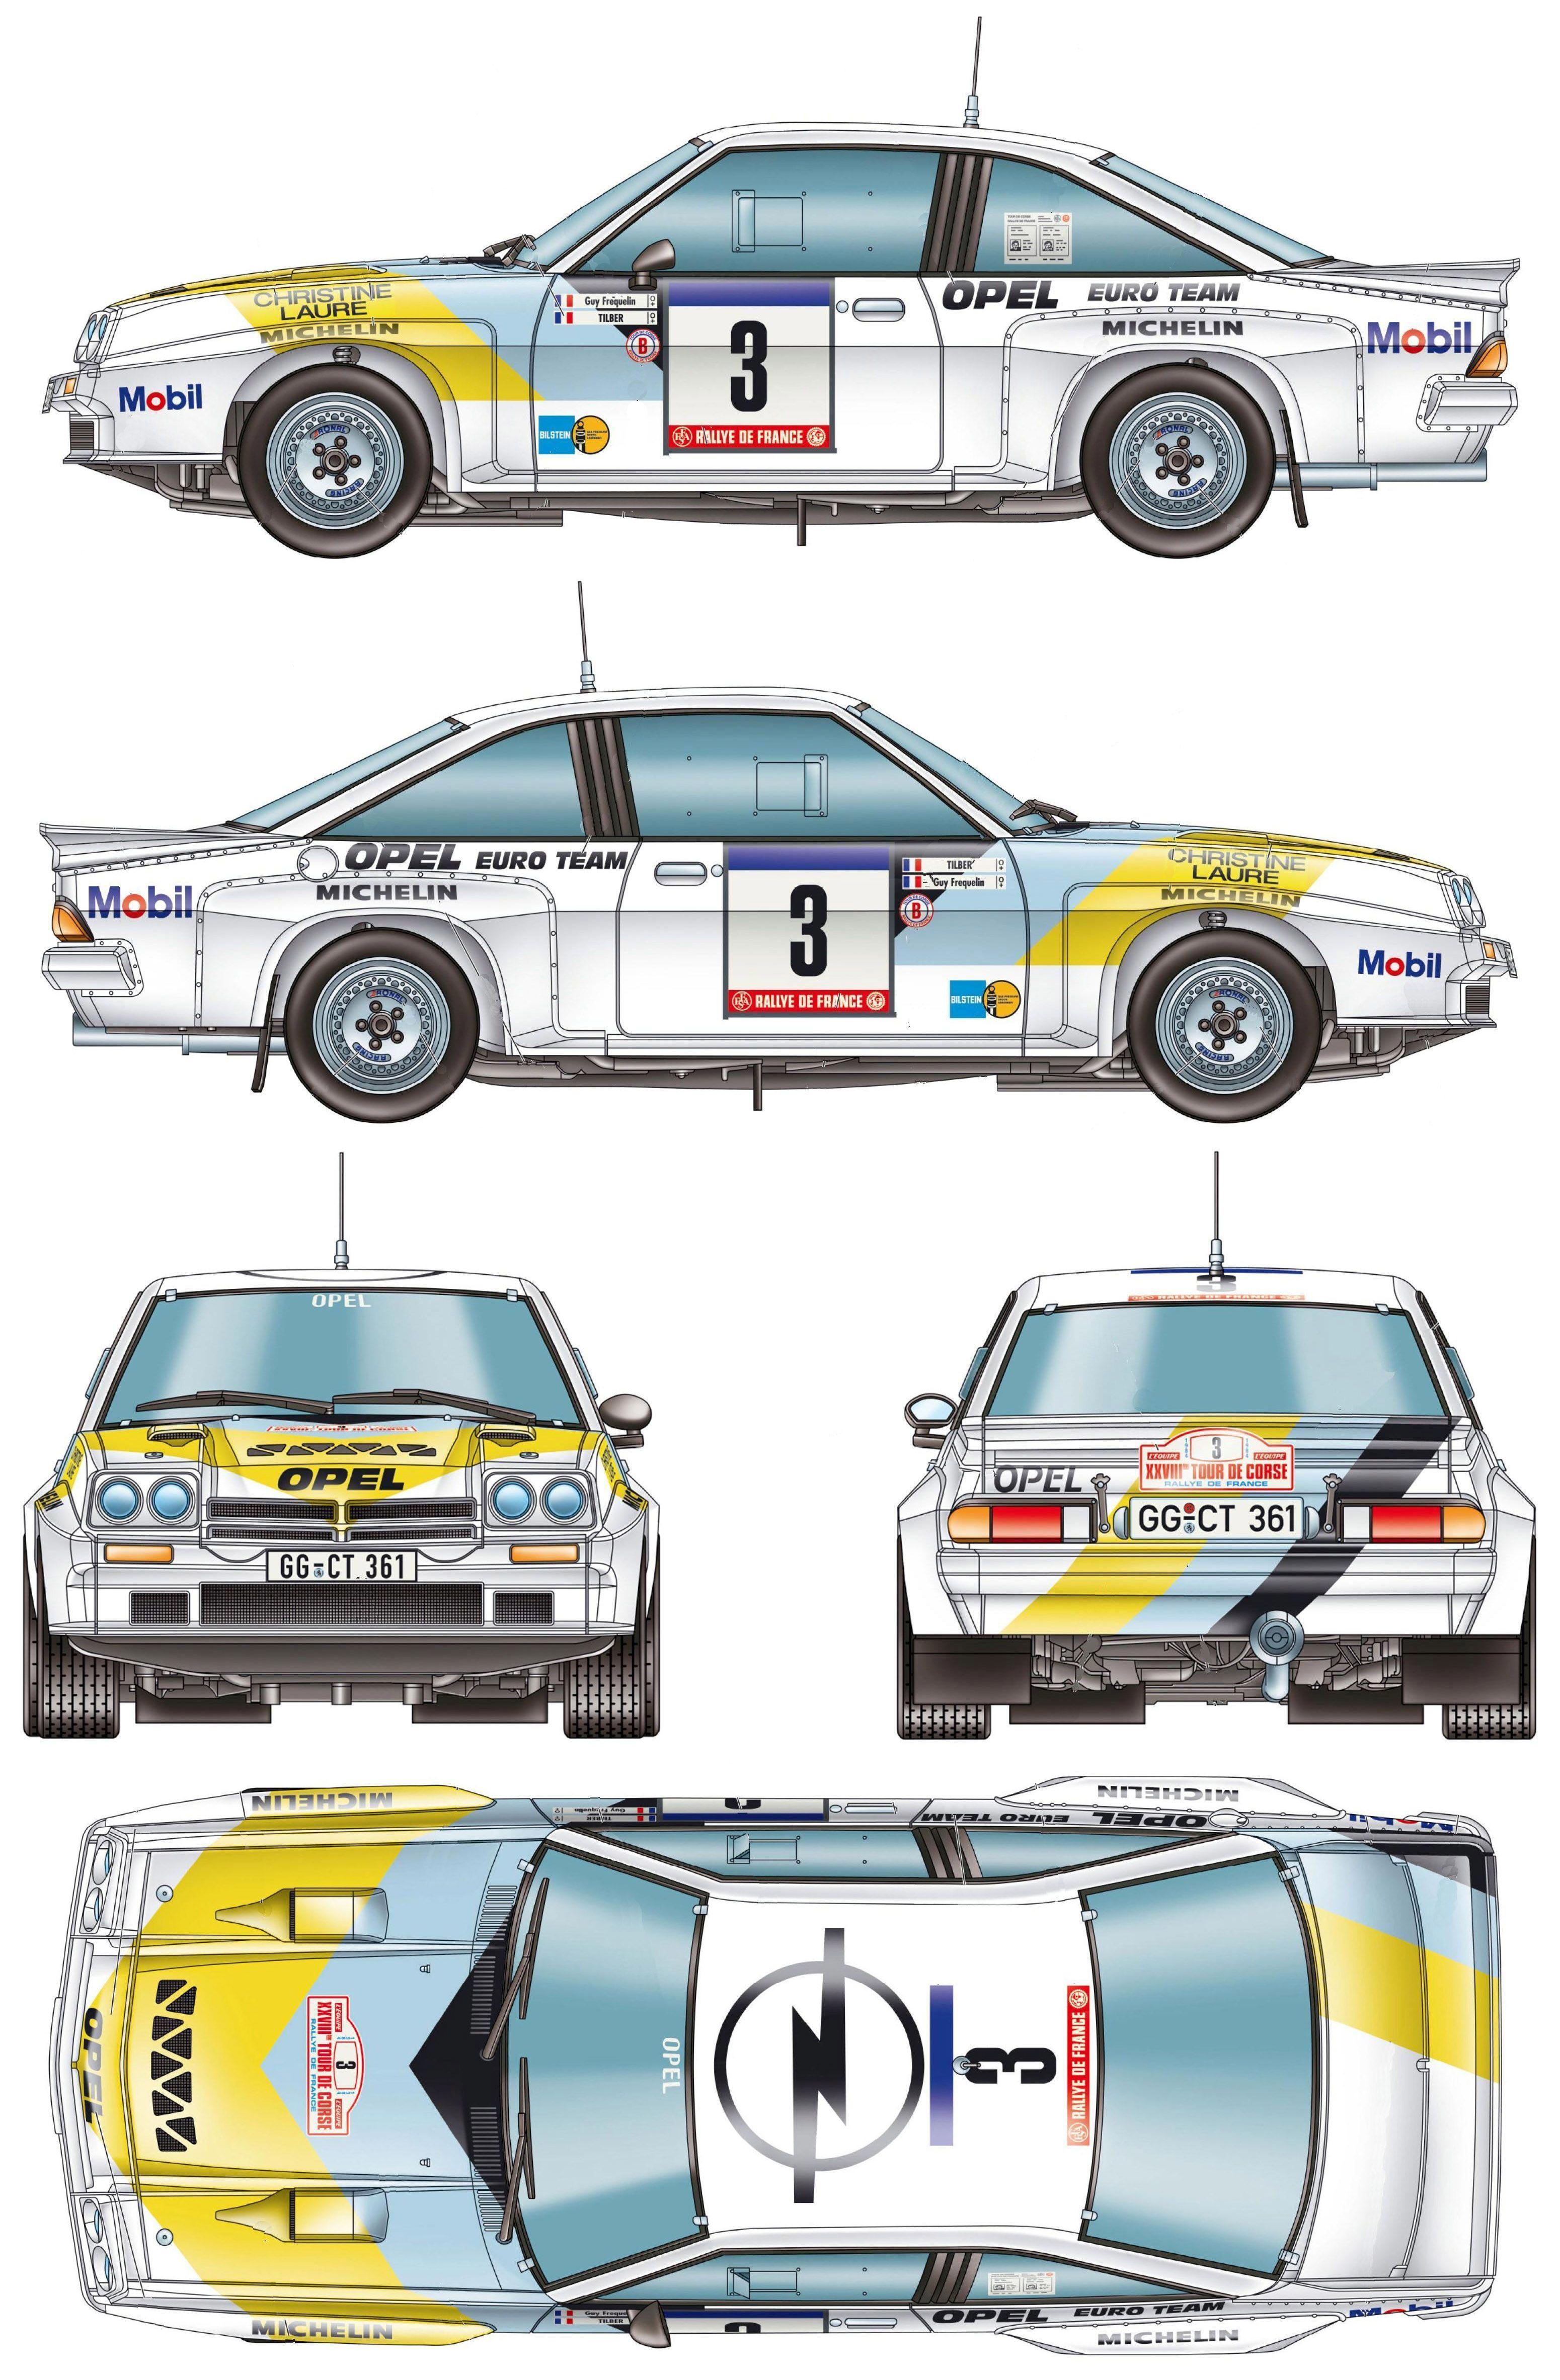 Opel Manta B 400 group B Rally Car blueprint